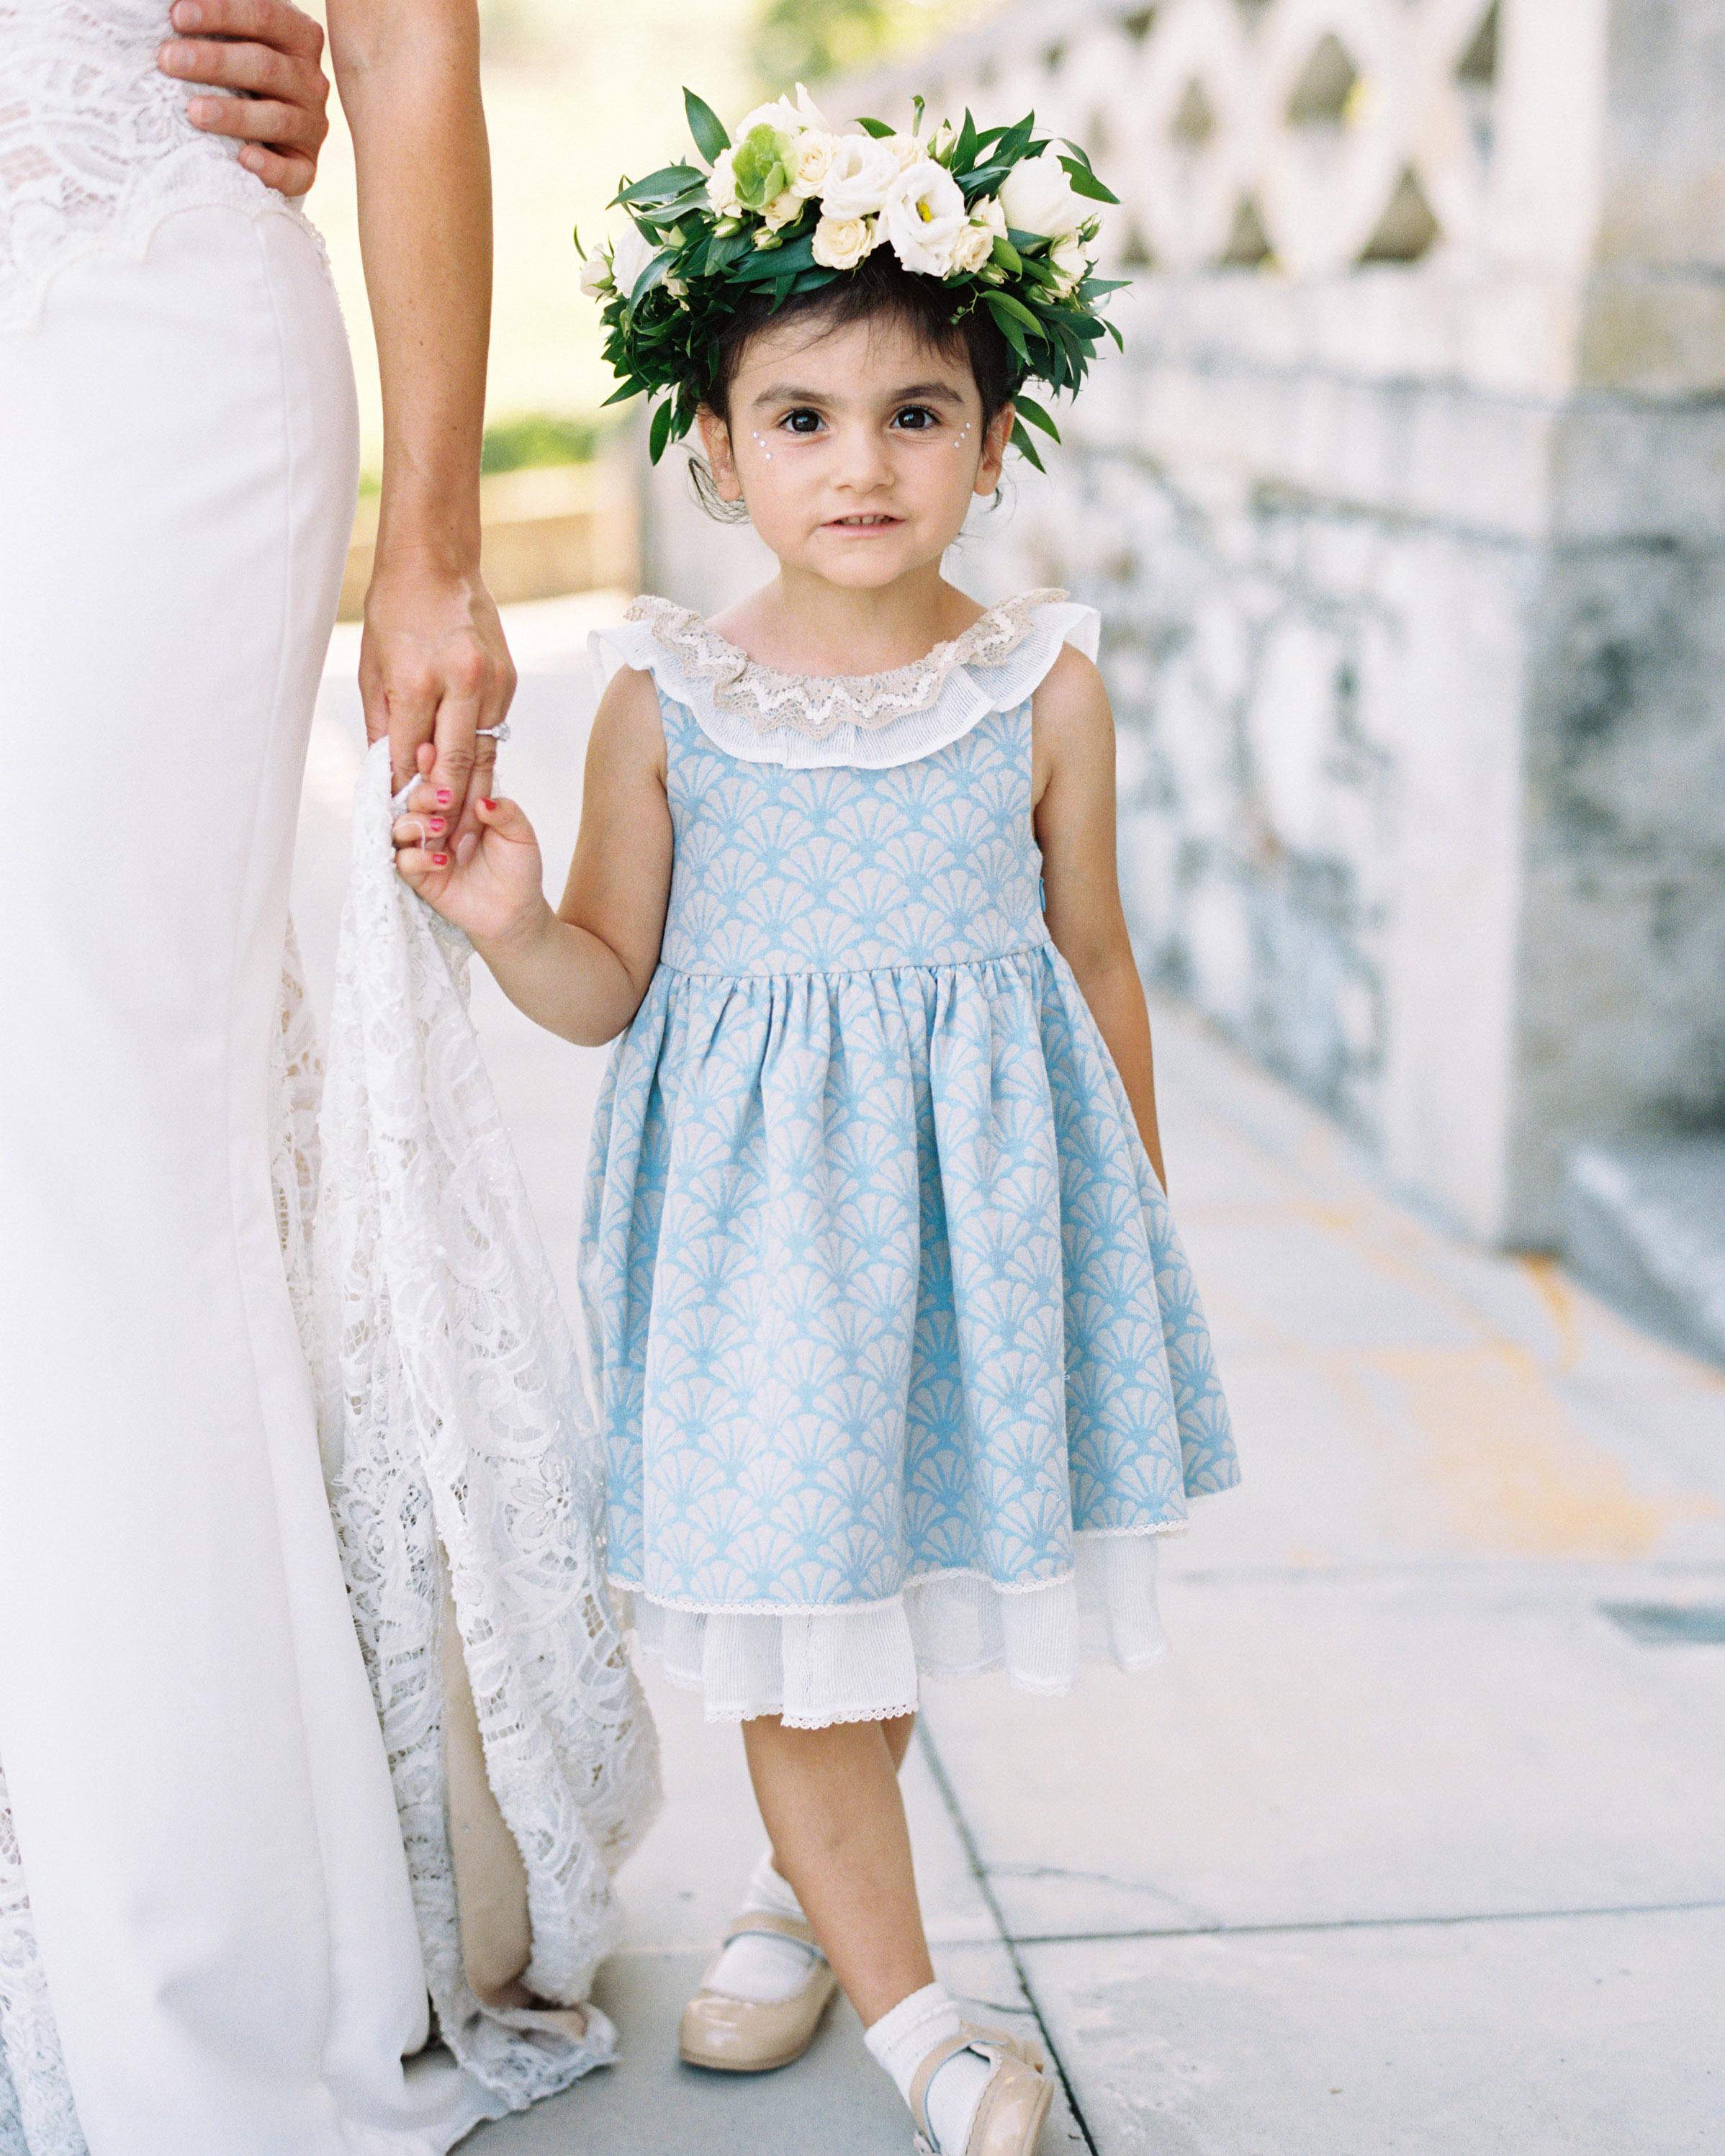 jeannette taylor wedding portugal flower girl